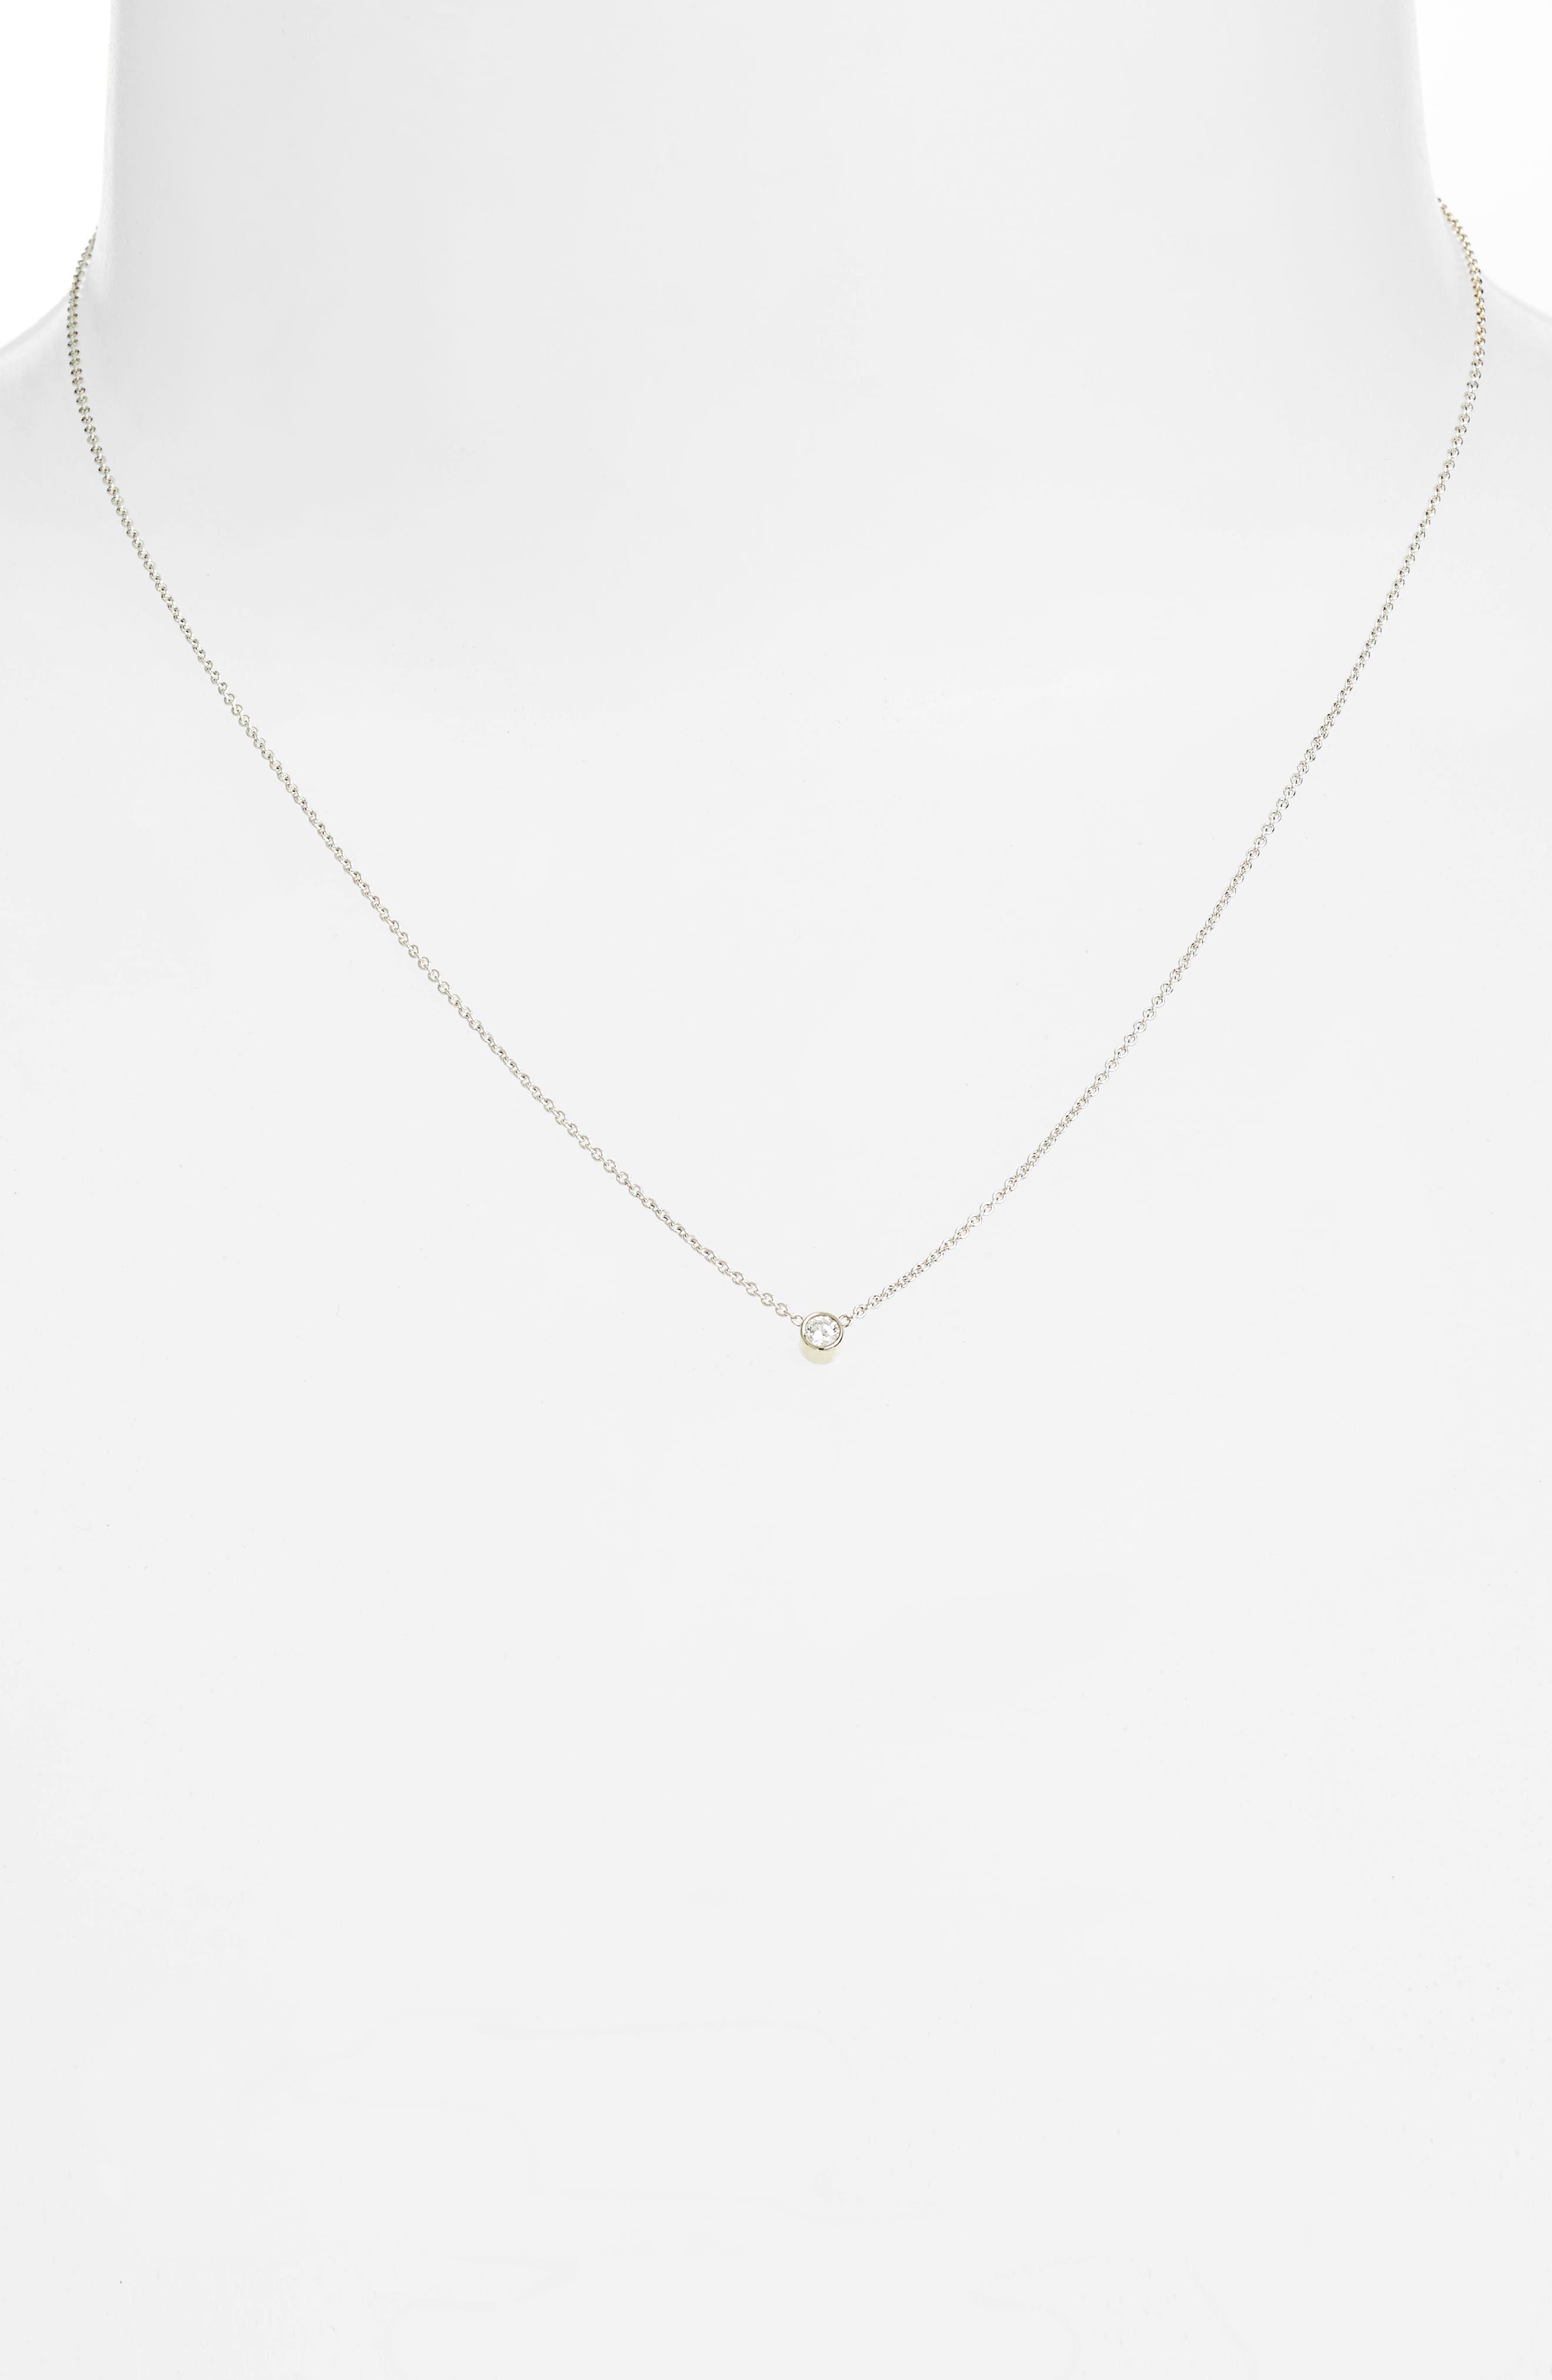 Diamond Bezel Pendant Necklace,                             Alternate thumbnail 3, color,                             WHITE GOLD